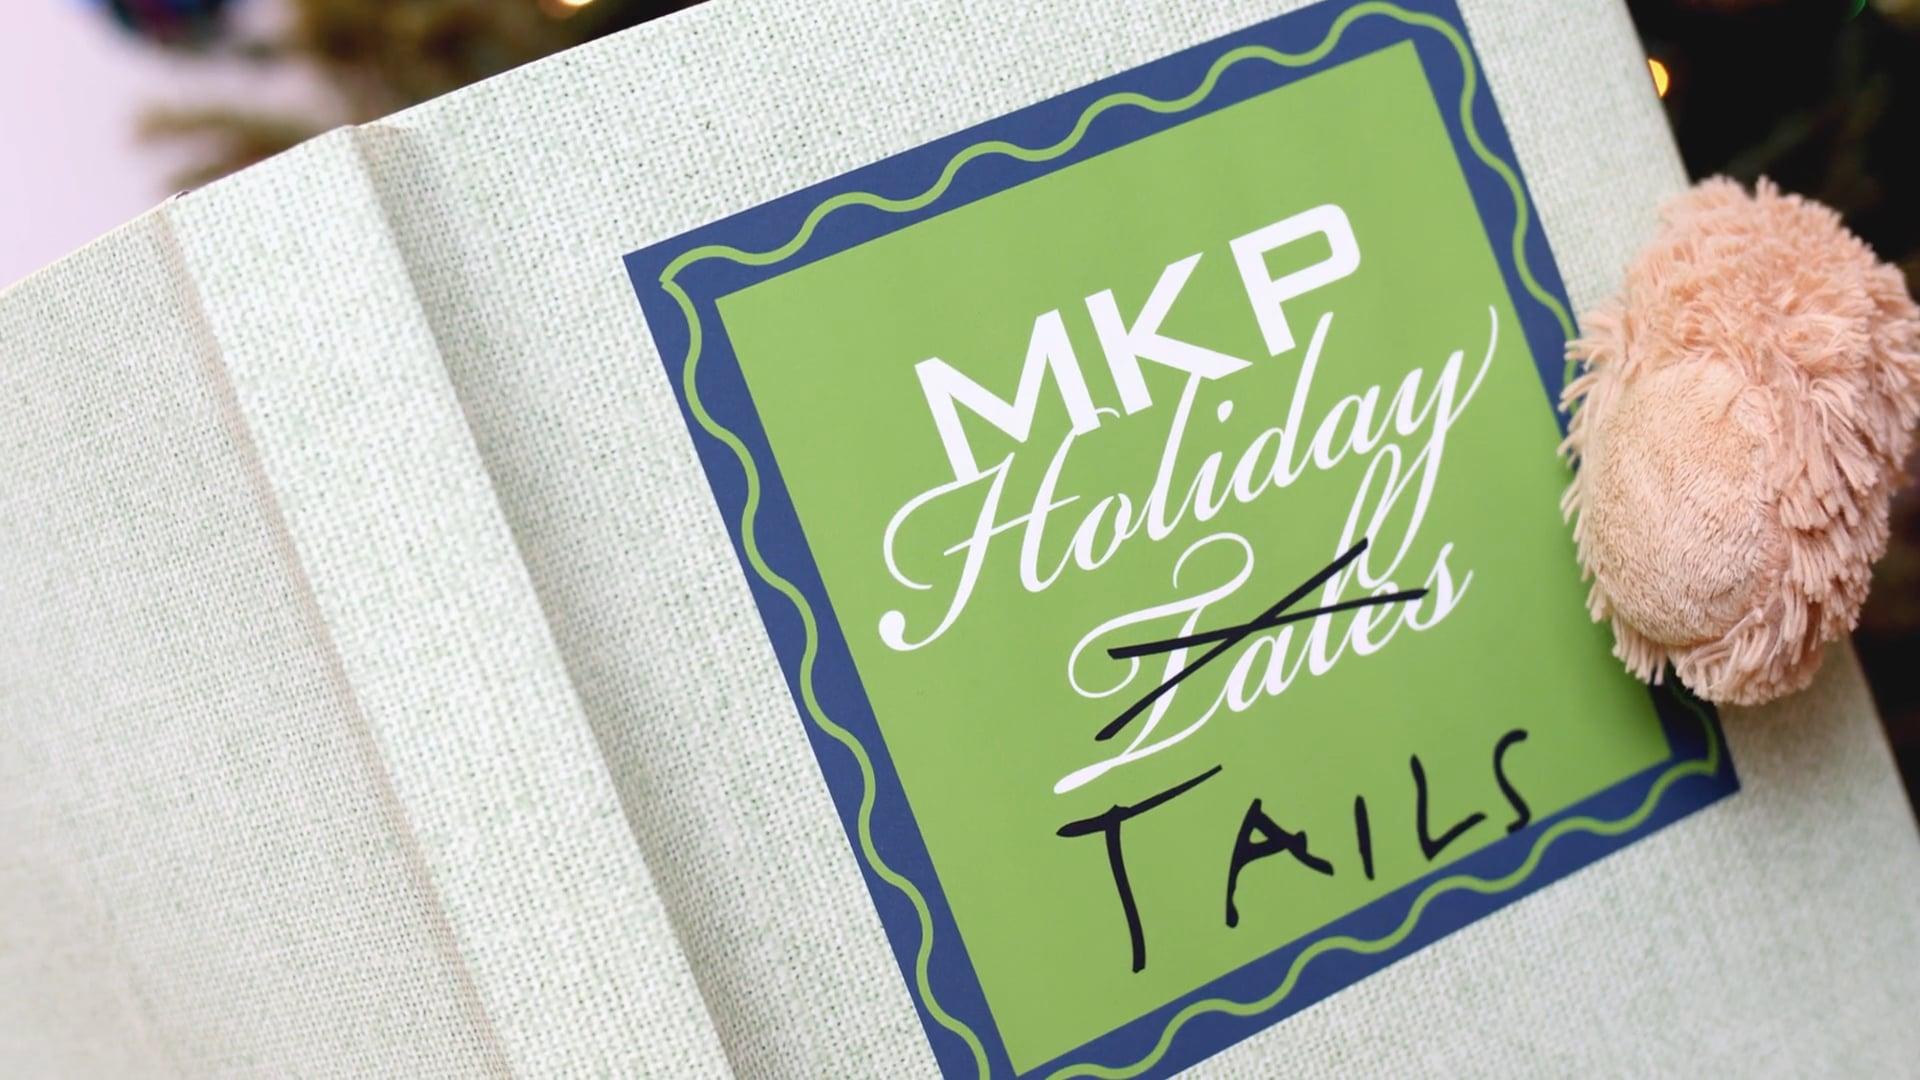 MKP Holiday Video 2017